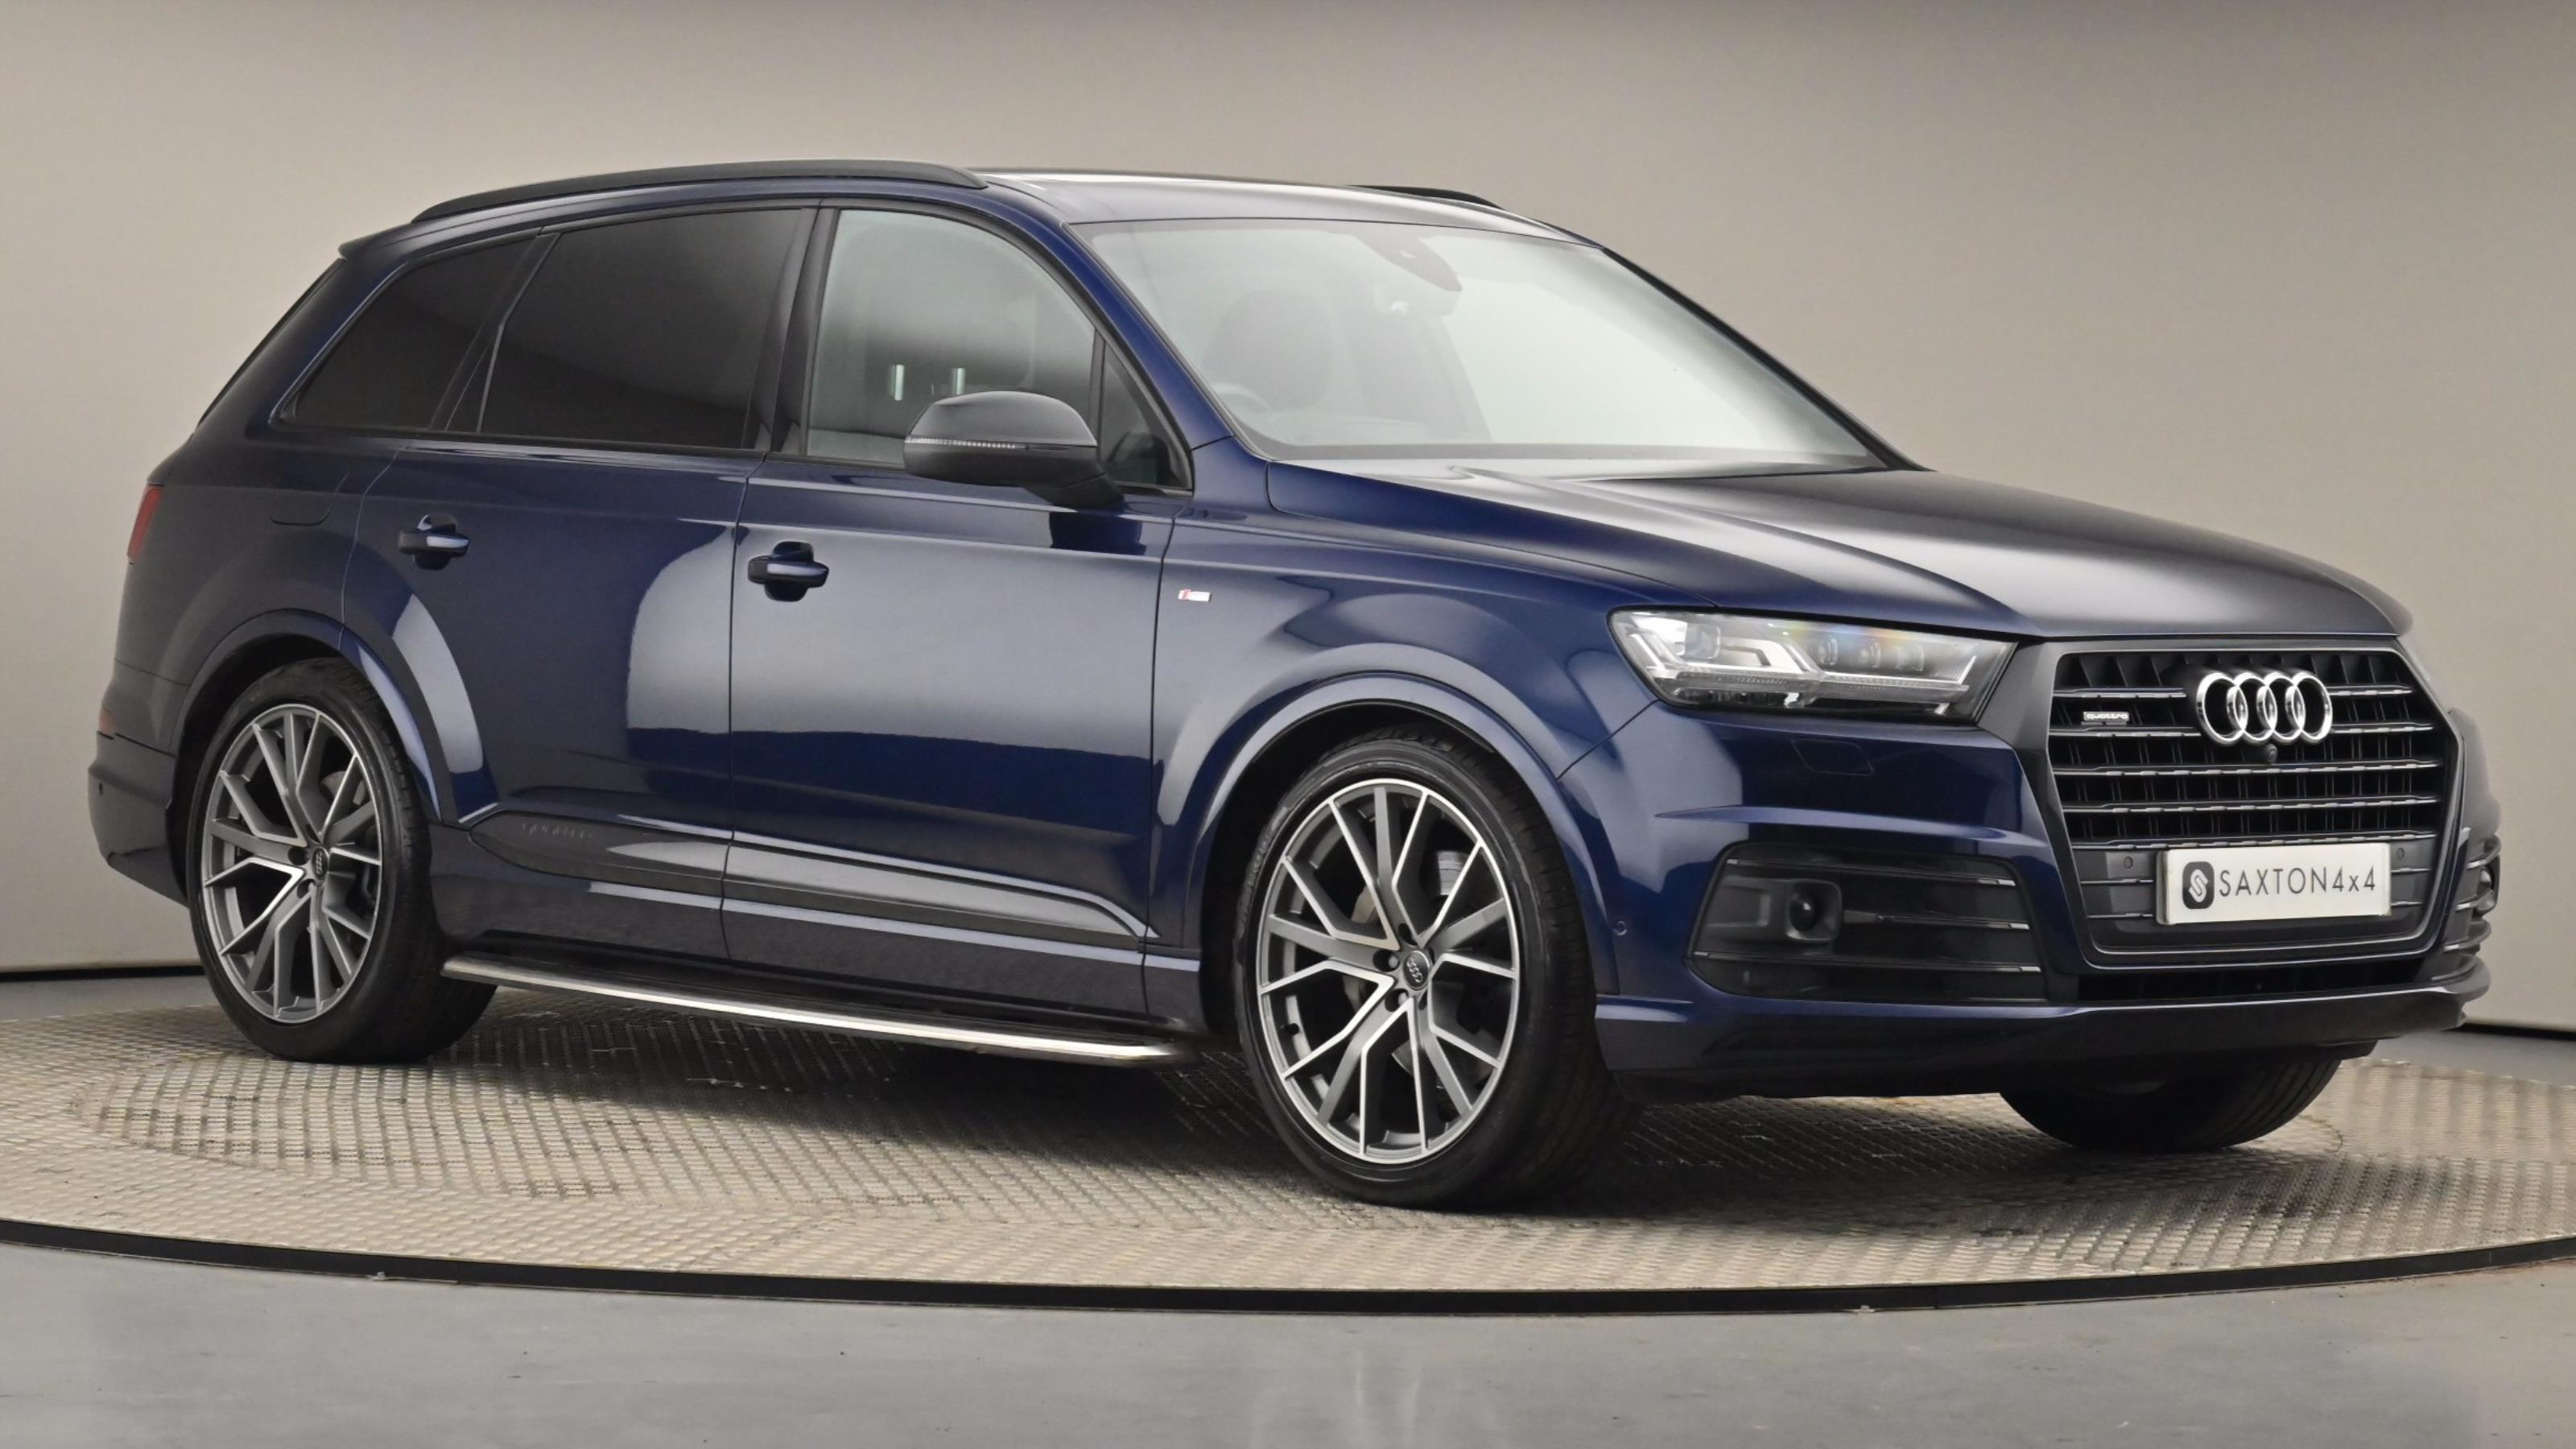 Used 2019 Audi Q7 50 TDI Quattro Vorsprung 5dr Tiptronic BLUE at Saxton4x4